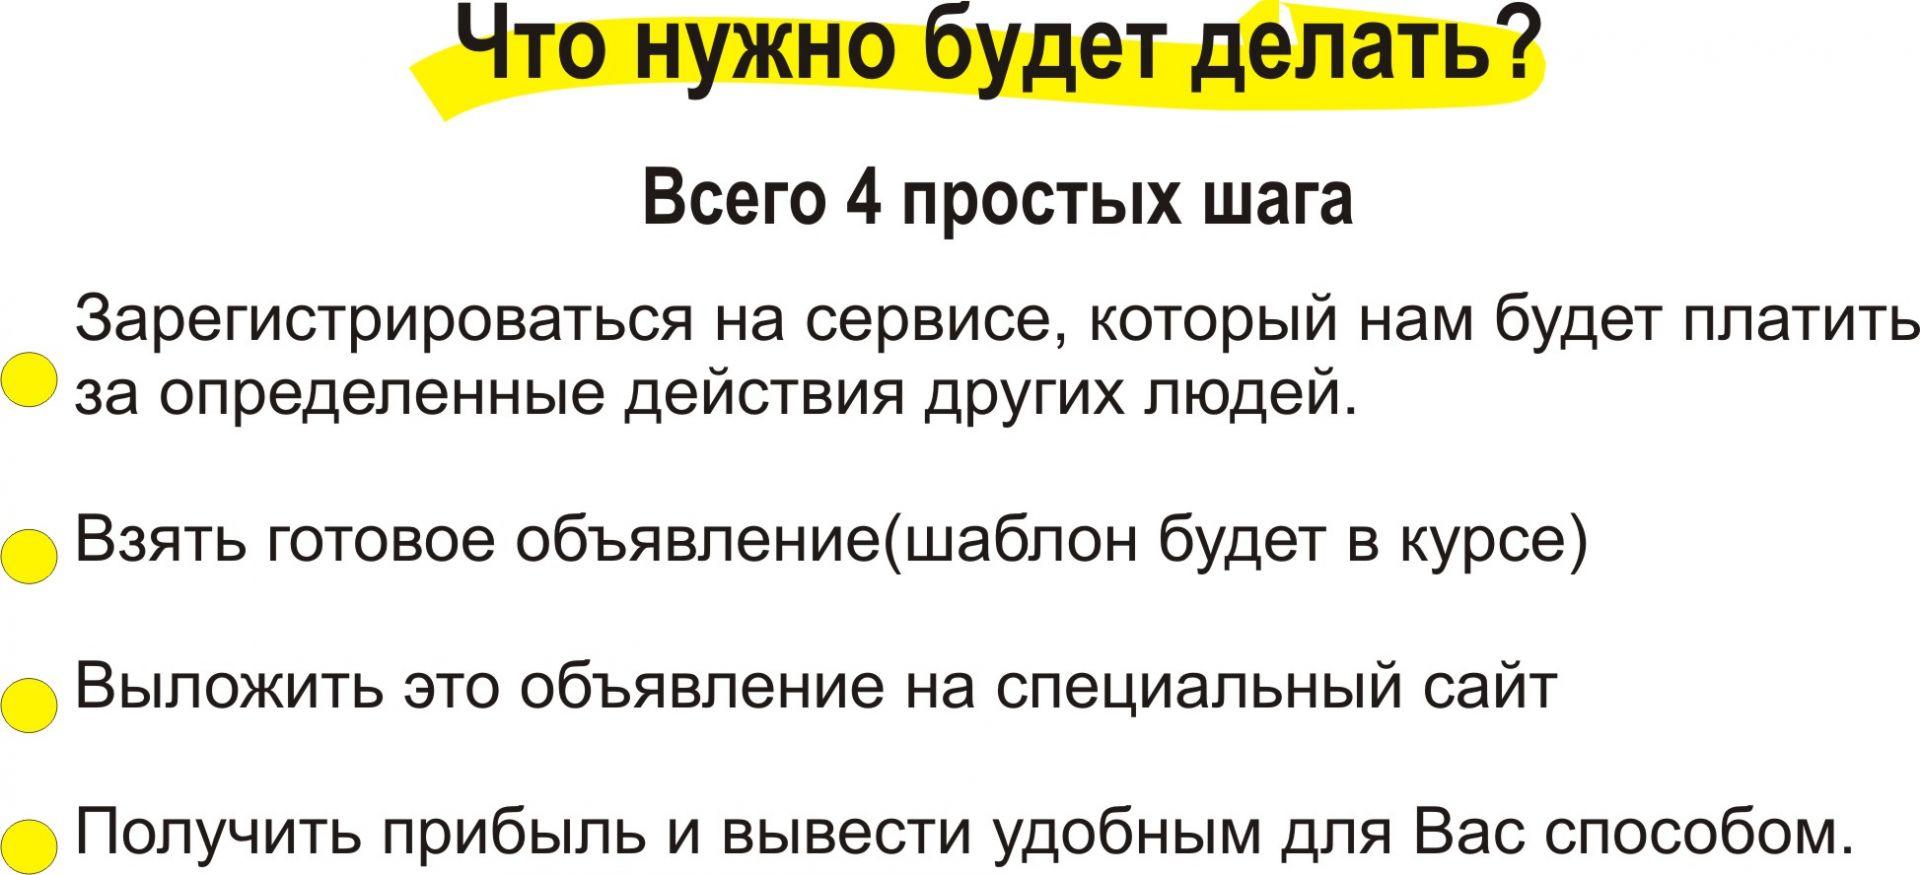 http://u1.platformalp.ru/91e2ca1e741df099d1914784d25a4715/3e95a1d2ed476ab53afb252e8bfa0361.jpg